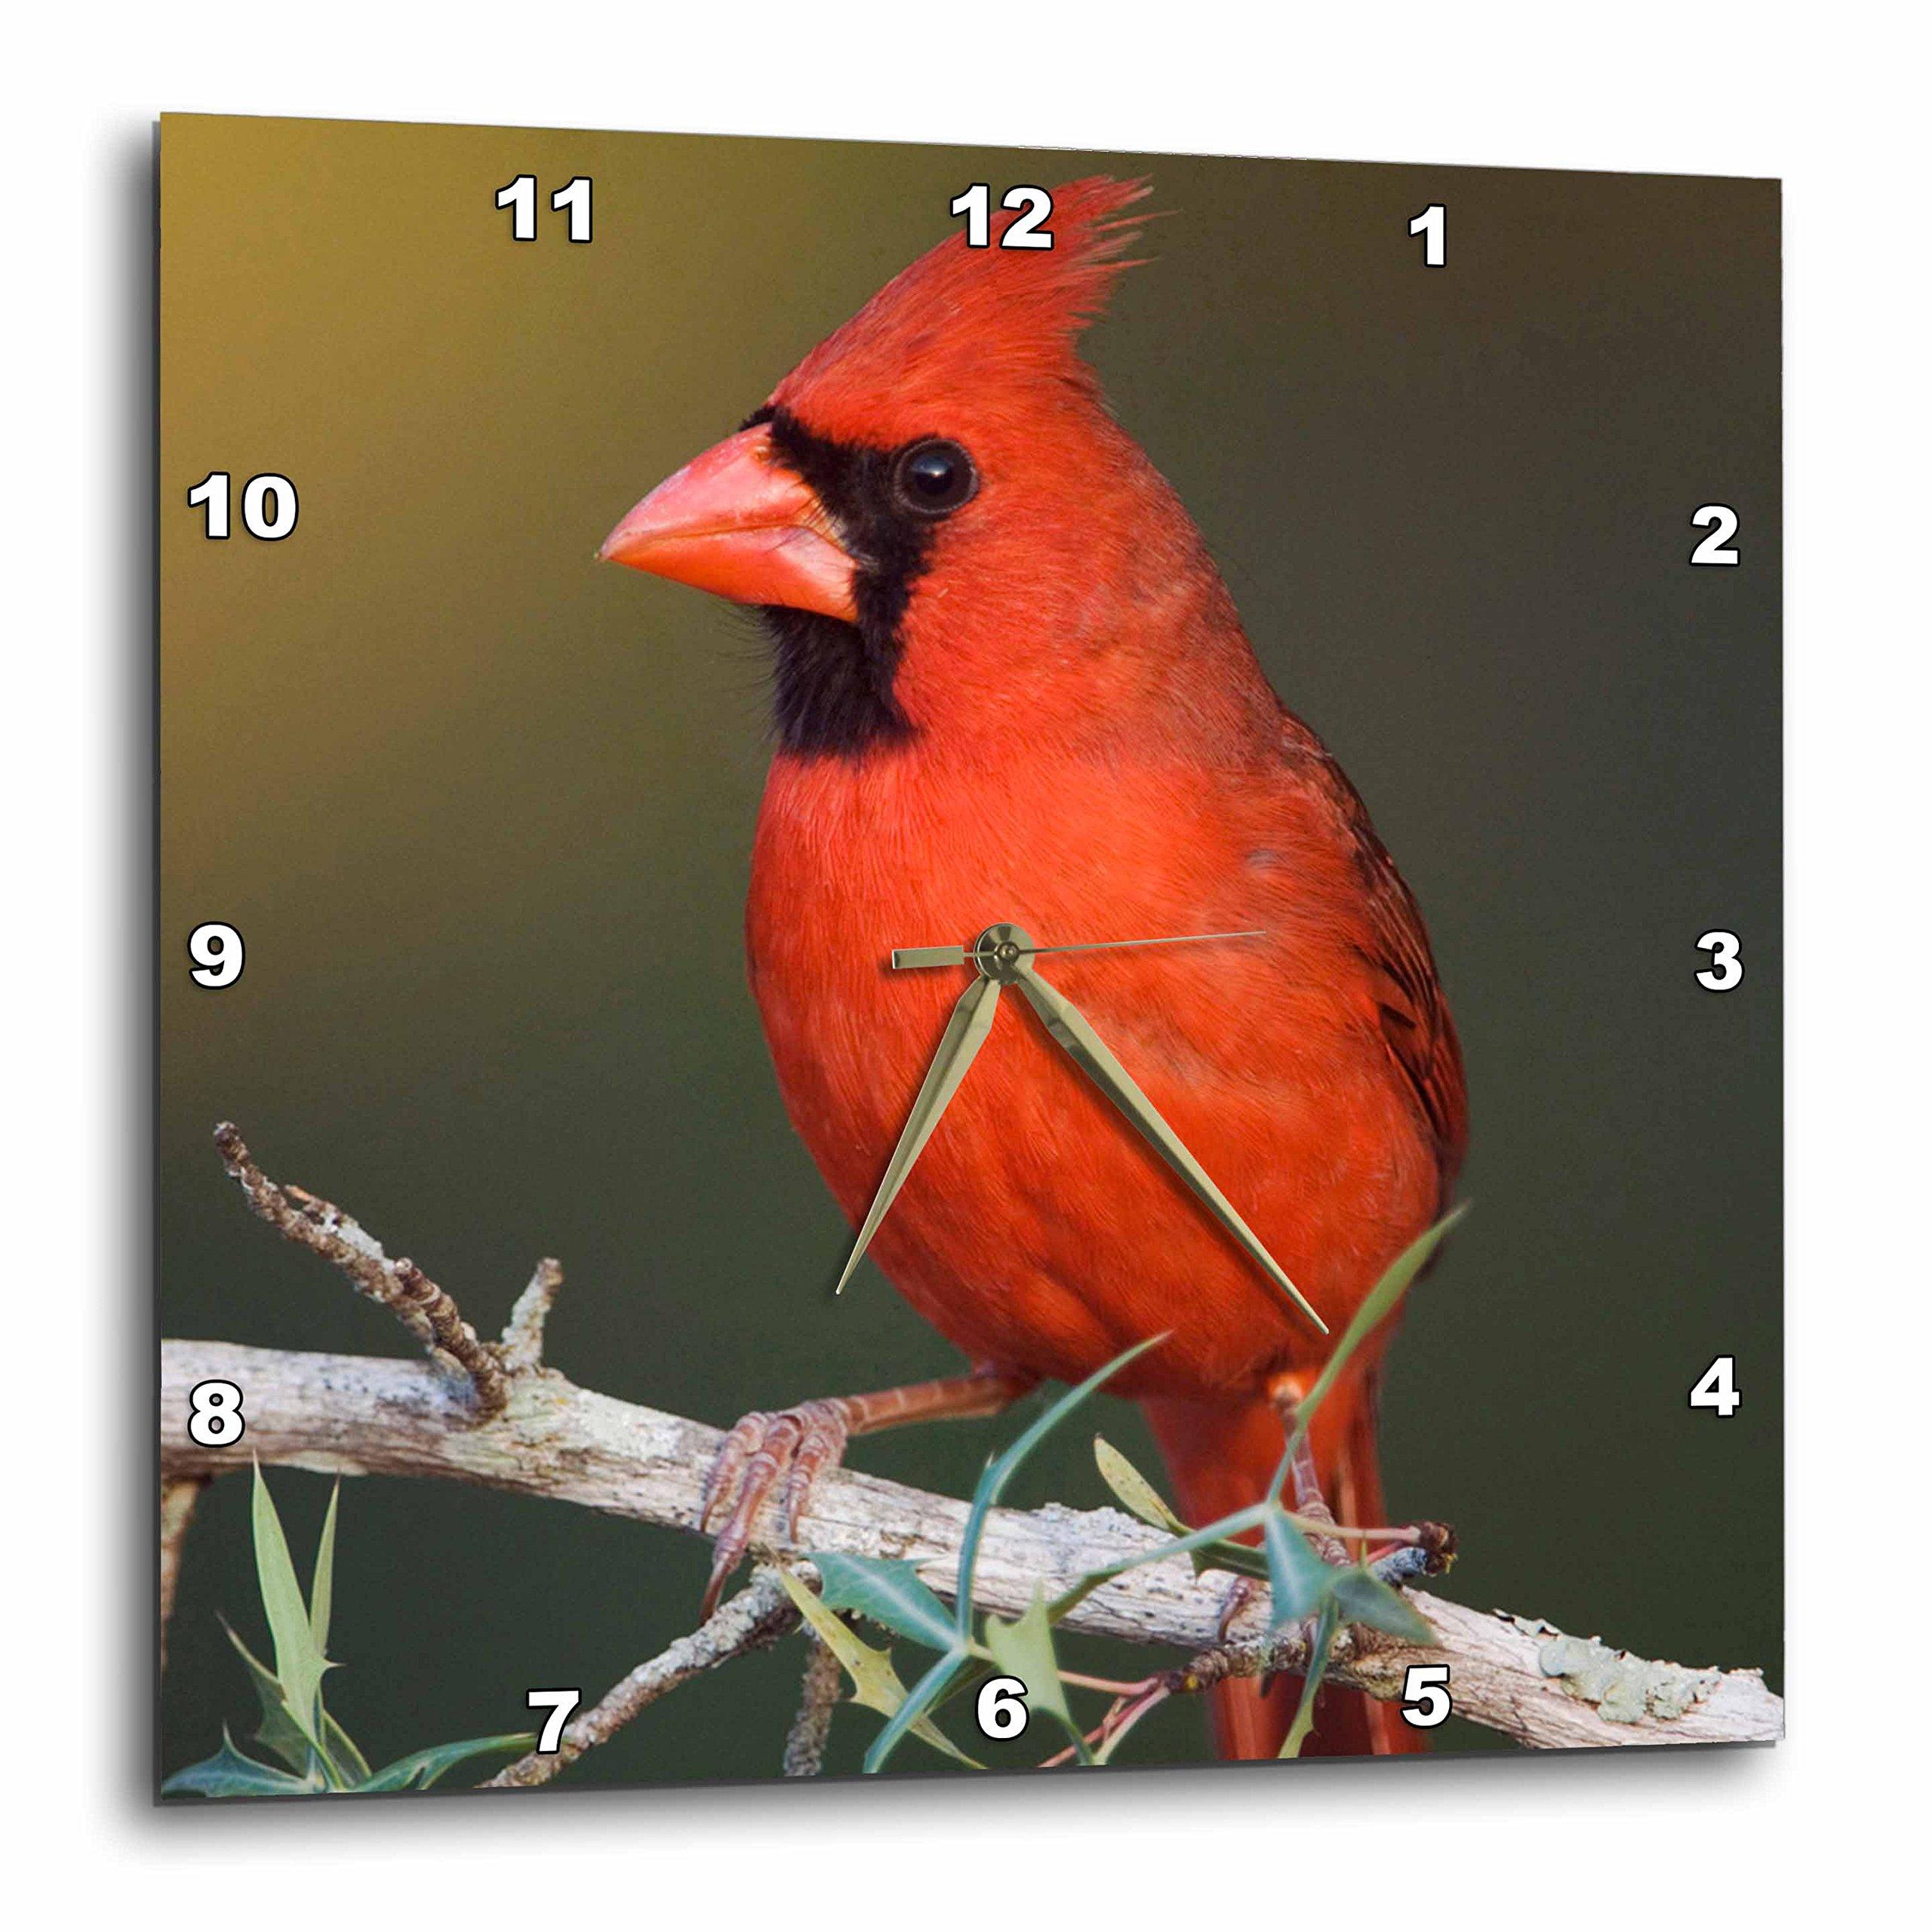 3dRose dpp_84317_1 Northern Cardinal bird, Hill Country, Texas - NA02 RNU0204 - Rolf Nussbaumer - Wall Clock, 10 by 10-Inch